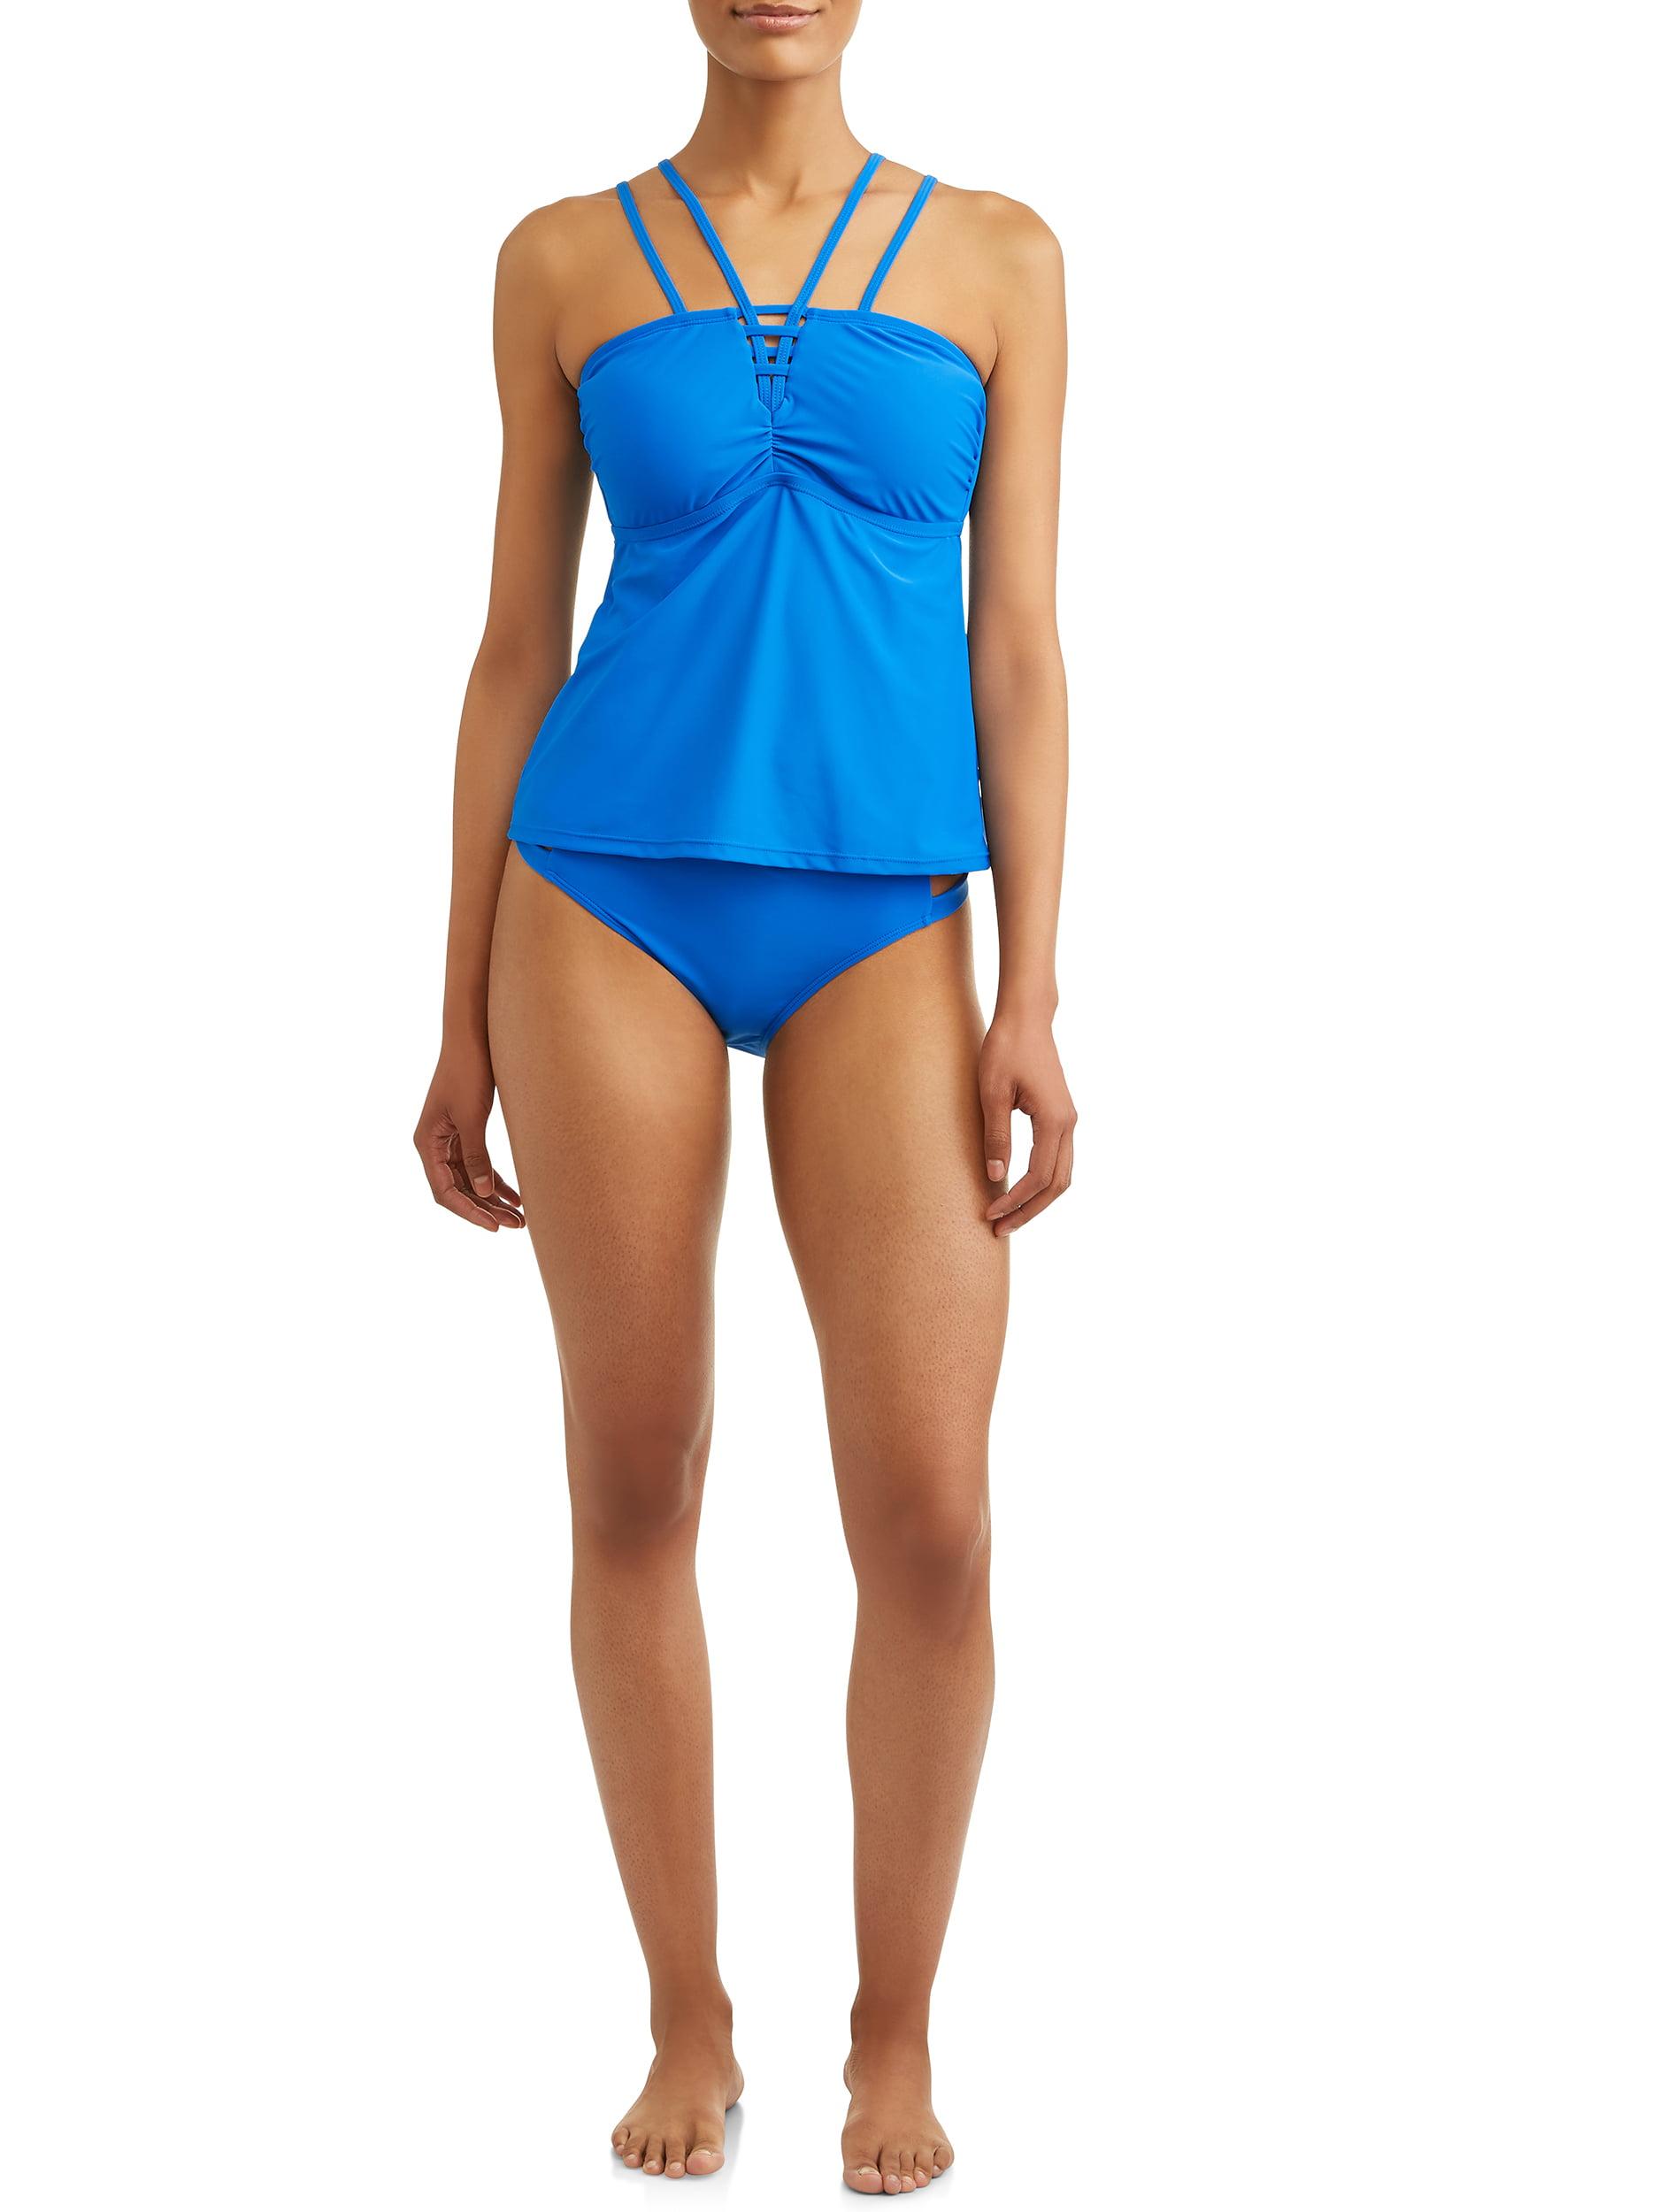 Pregnant One-Piece Swimwear Blue Plaid Blue,XL Wesraica Maternity Halter Bathing Suit Strappy Adjustable